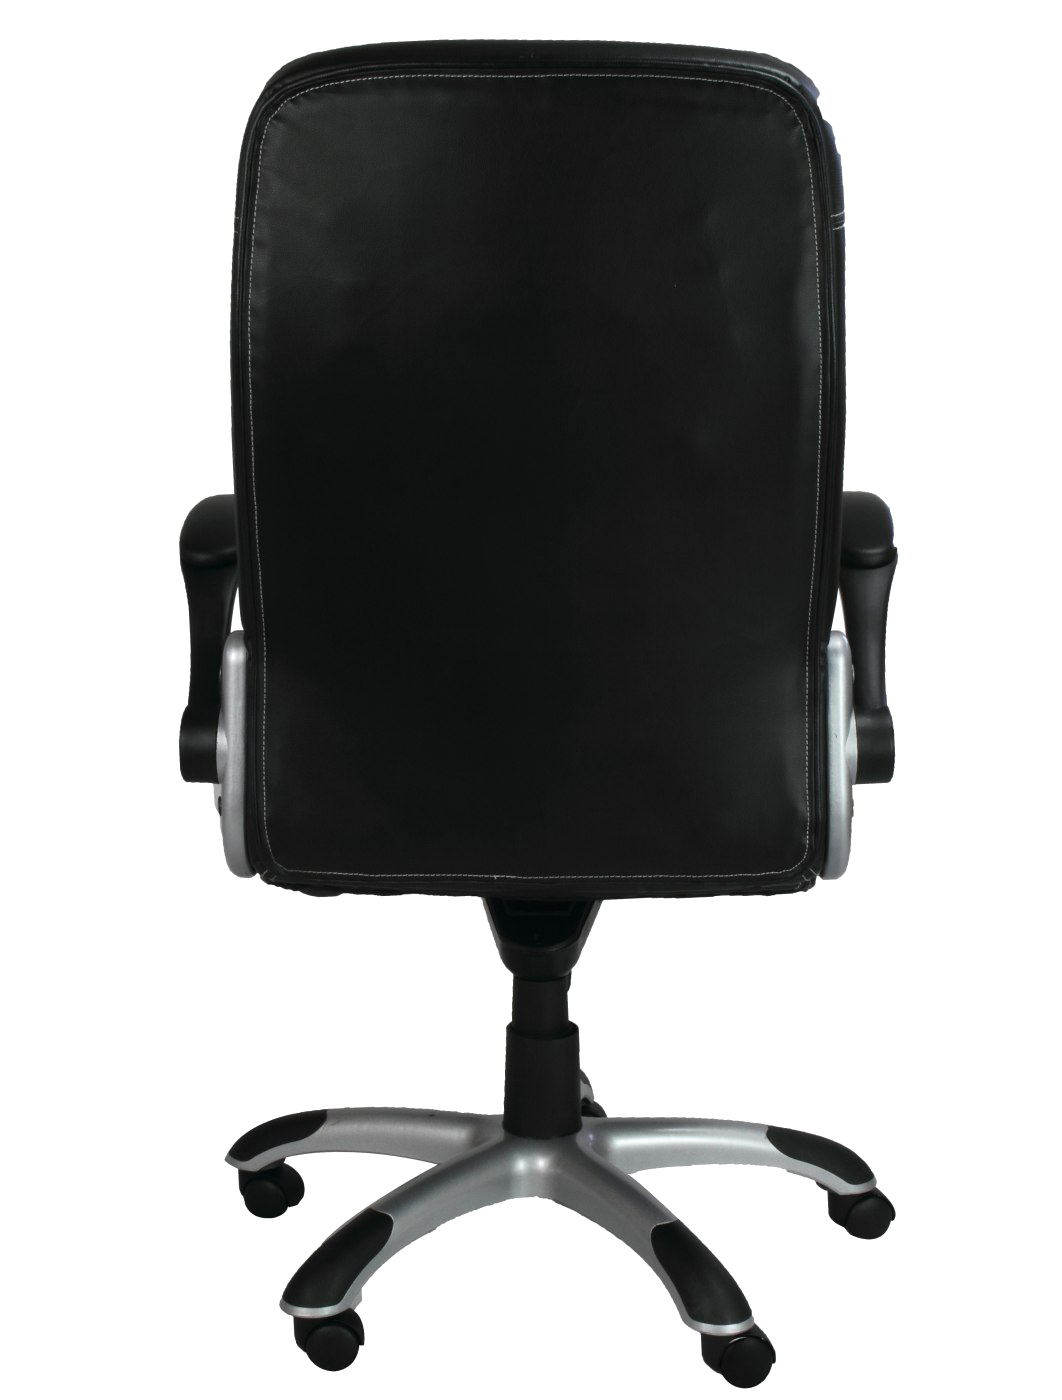 Clipart desk transparent background. Chair png mart